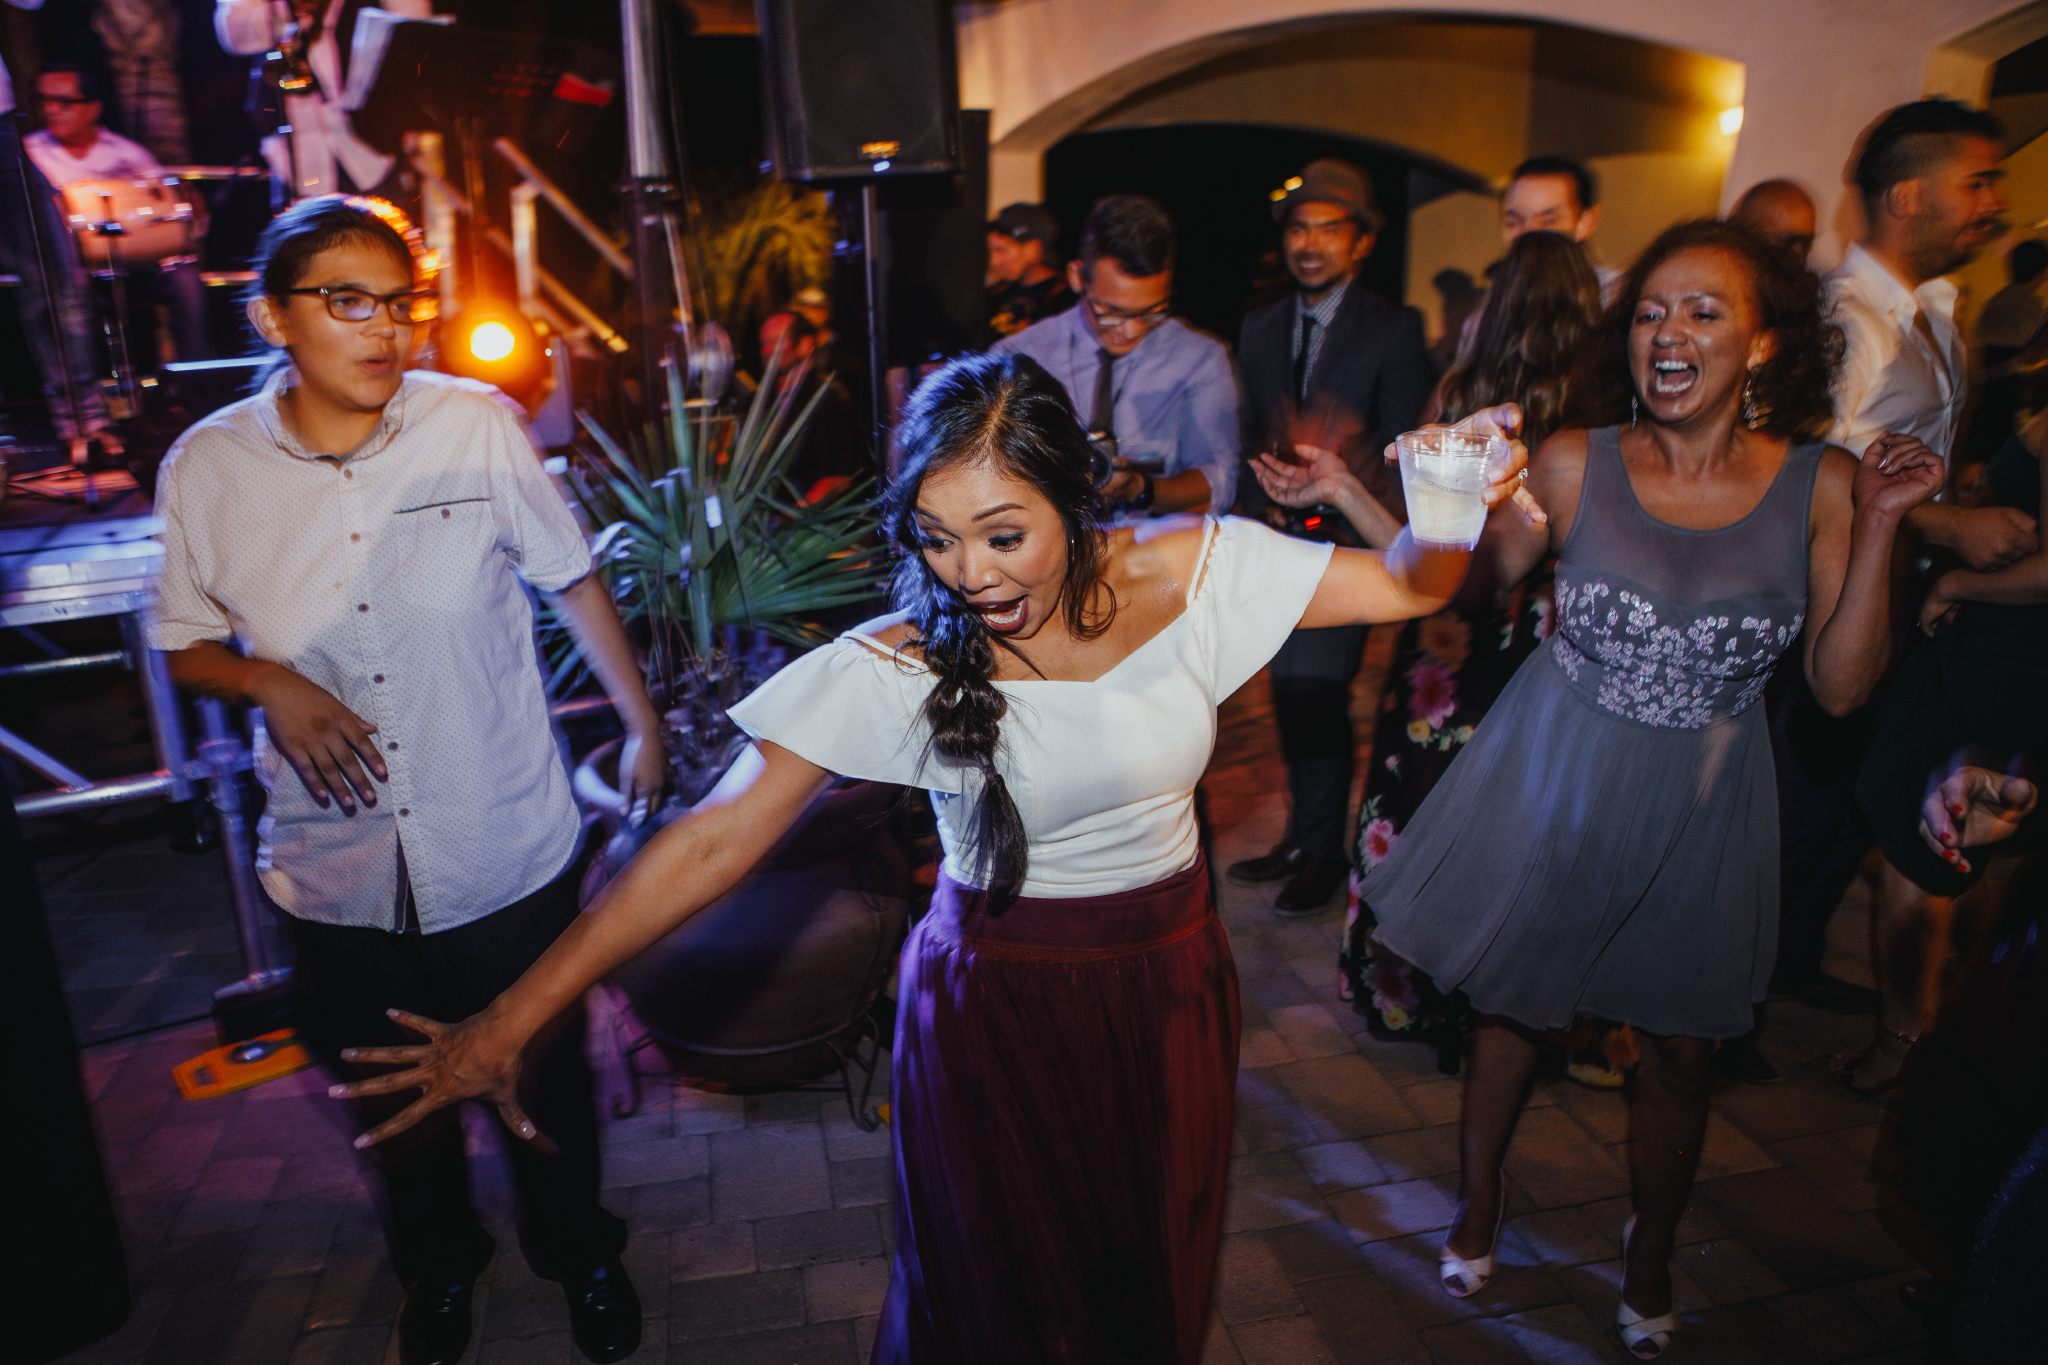 San Diego Wedding Photographer | maid of honor dancing